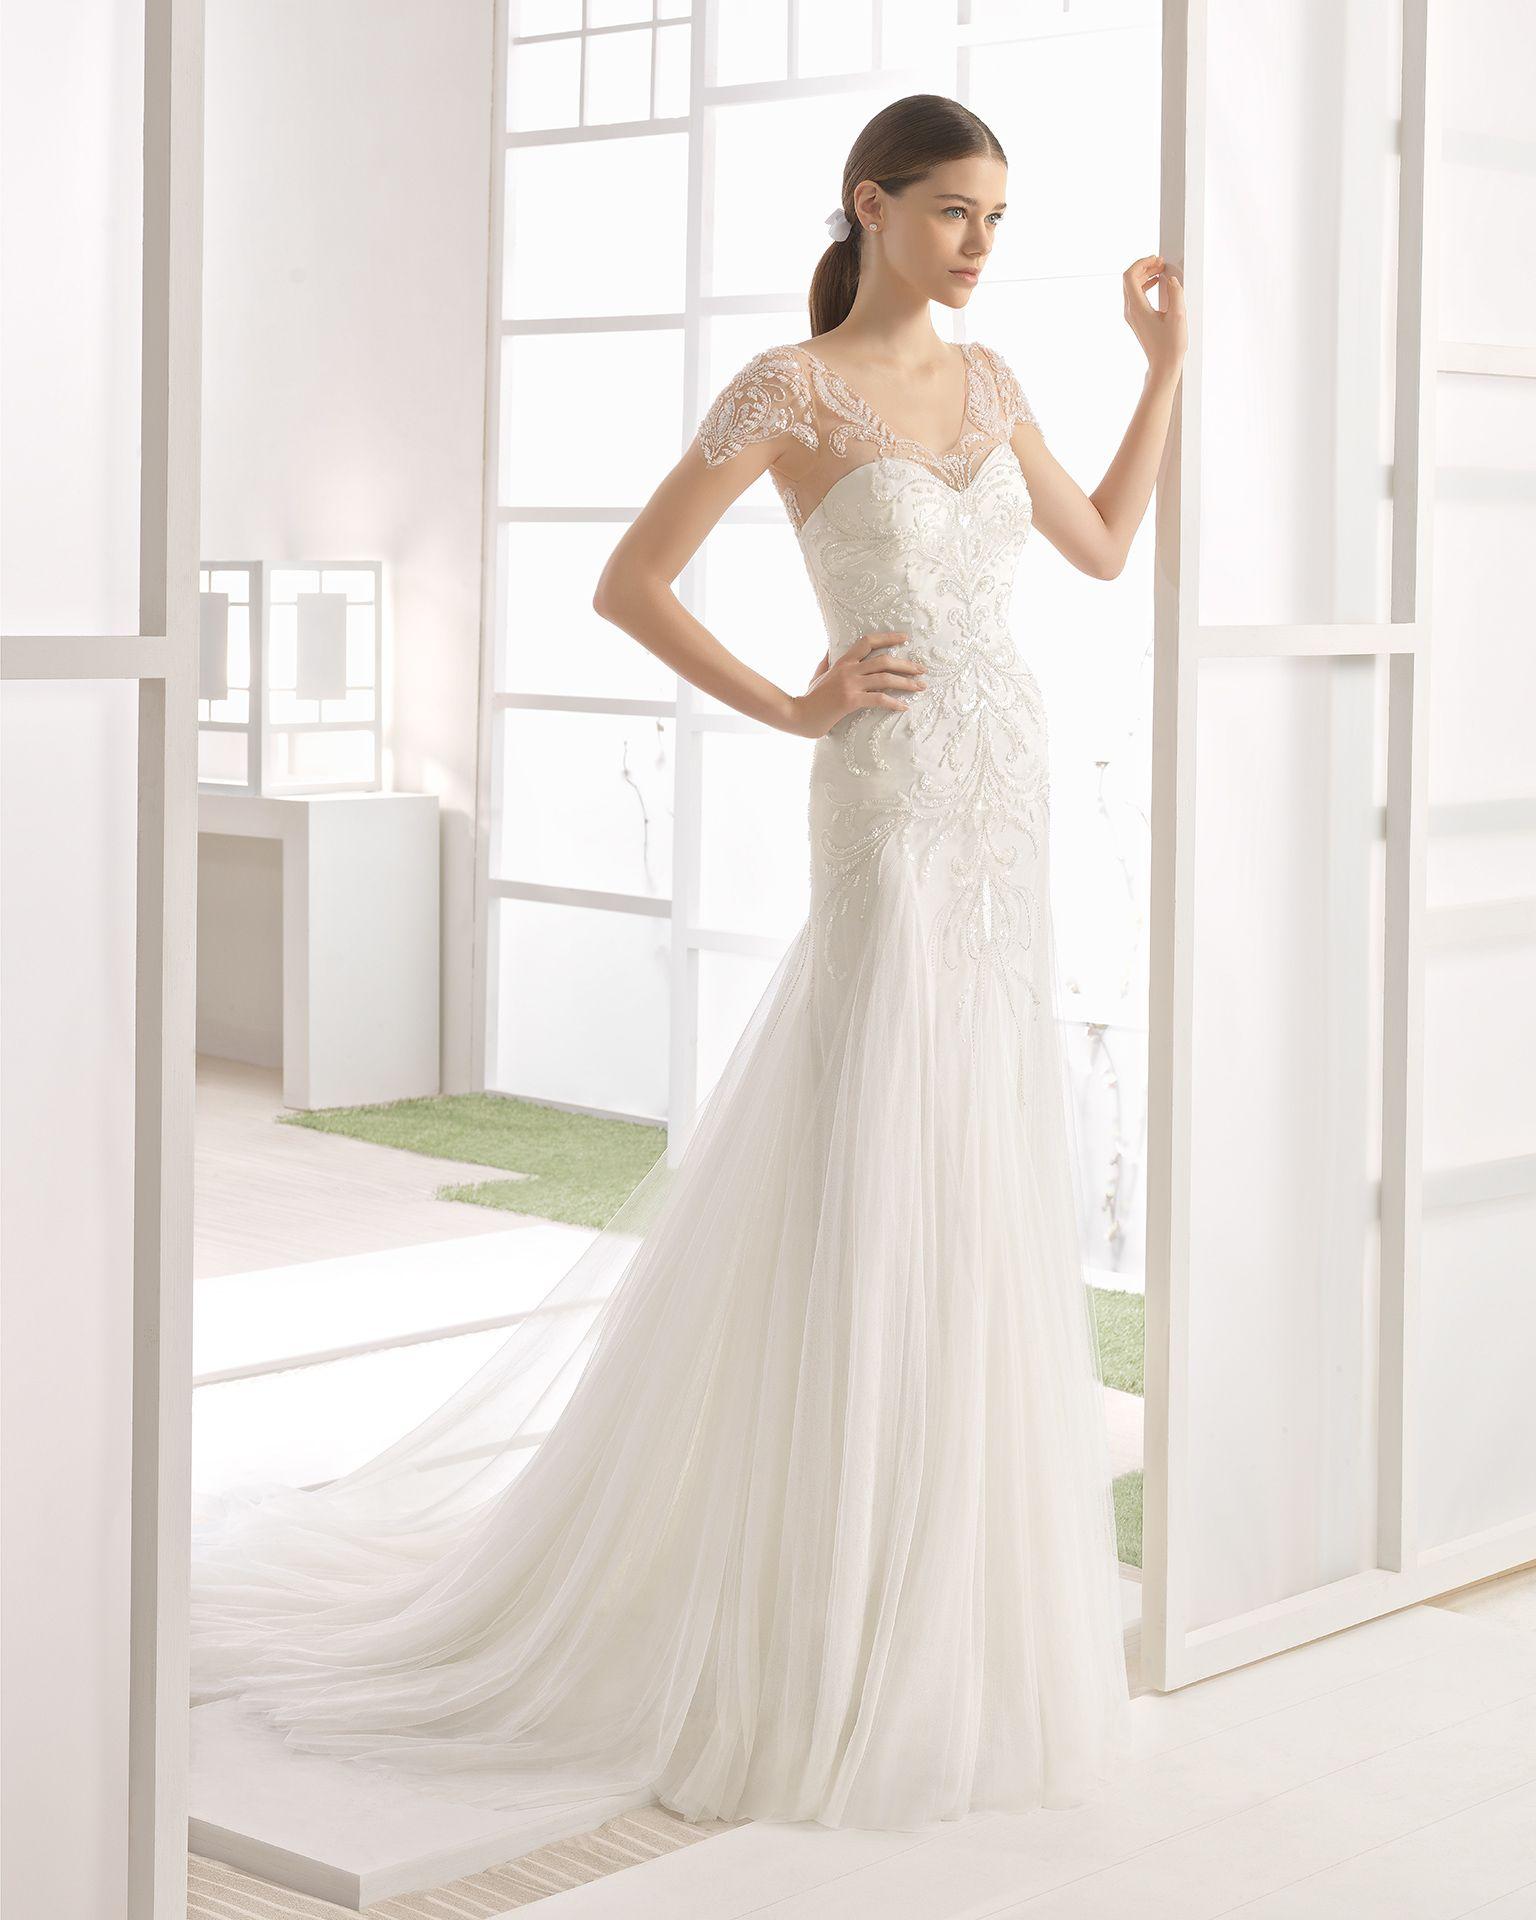 0e57eb1da WILMA Vestido de novia sirena de pedrería con godettes de tul suave